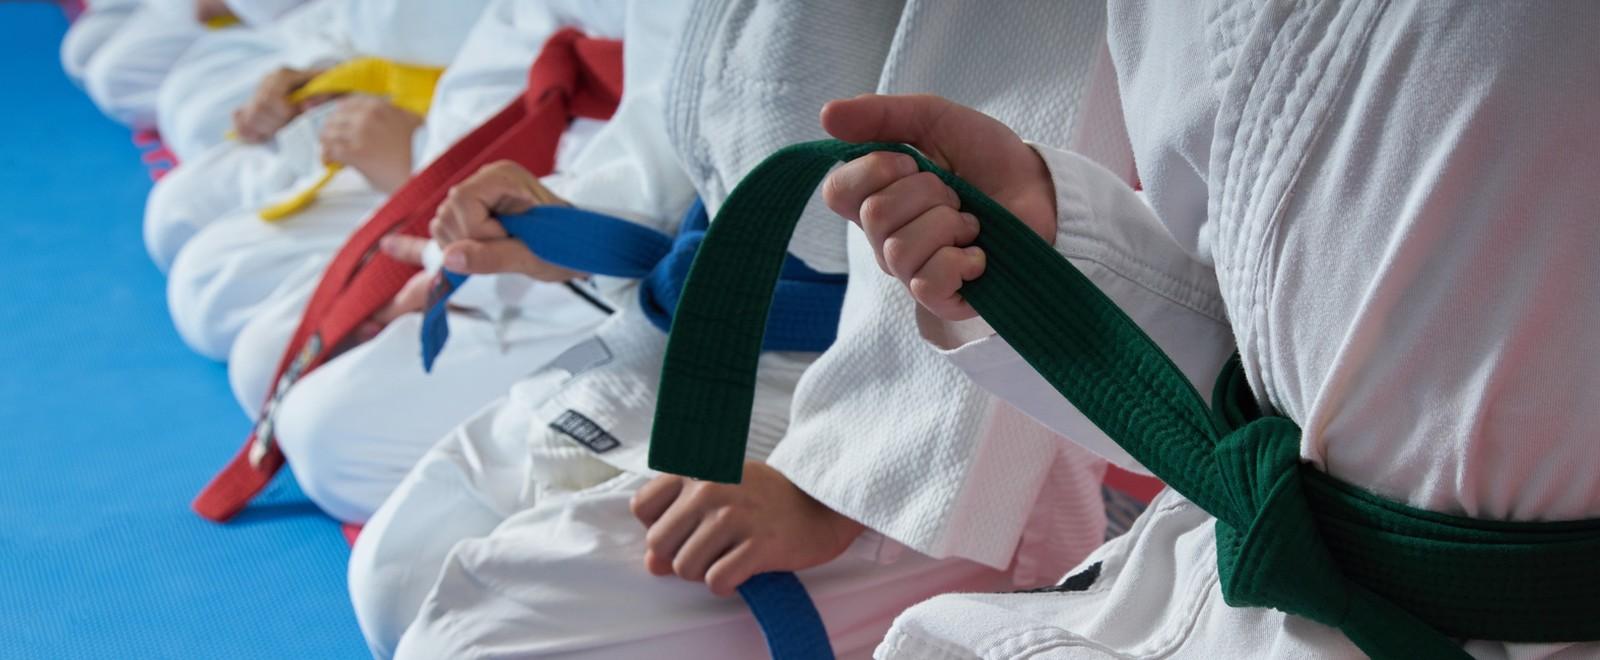 judo_f_96684378